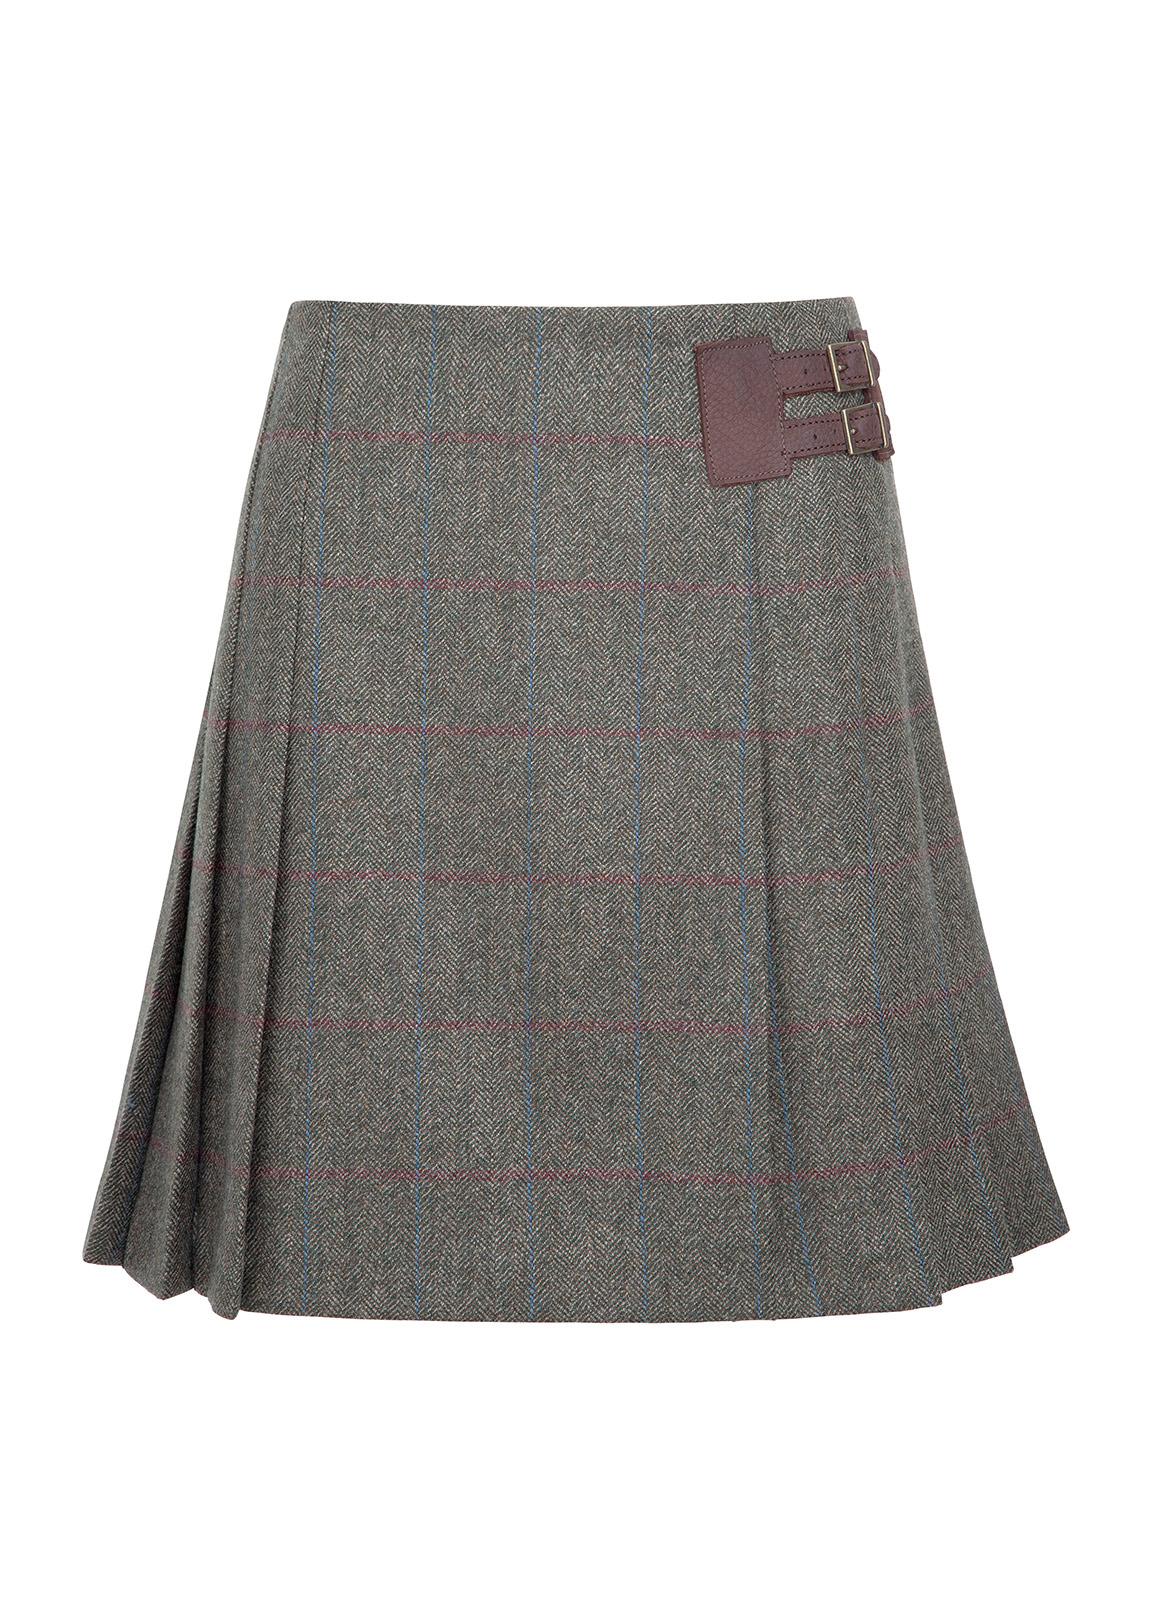 Dubarry_ Foxglove Tweed Skirt - Moss_Image_2